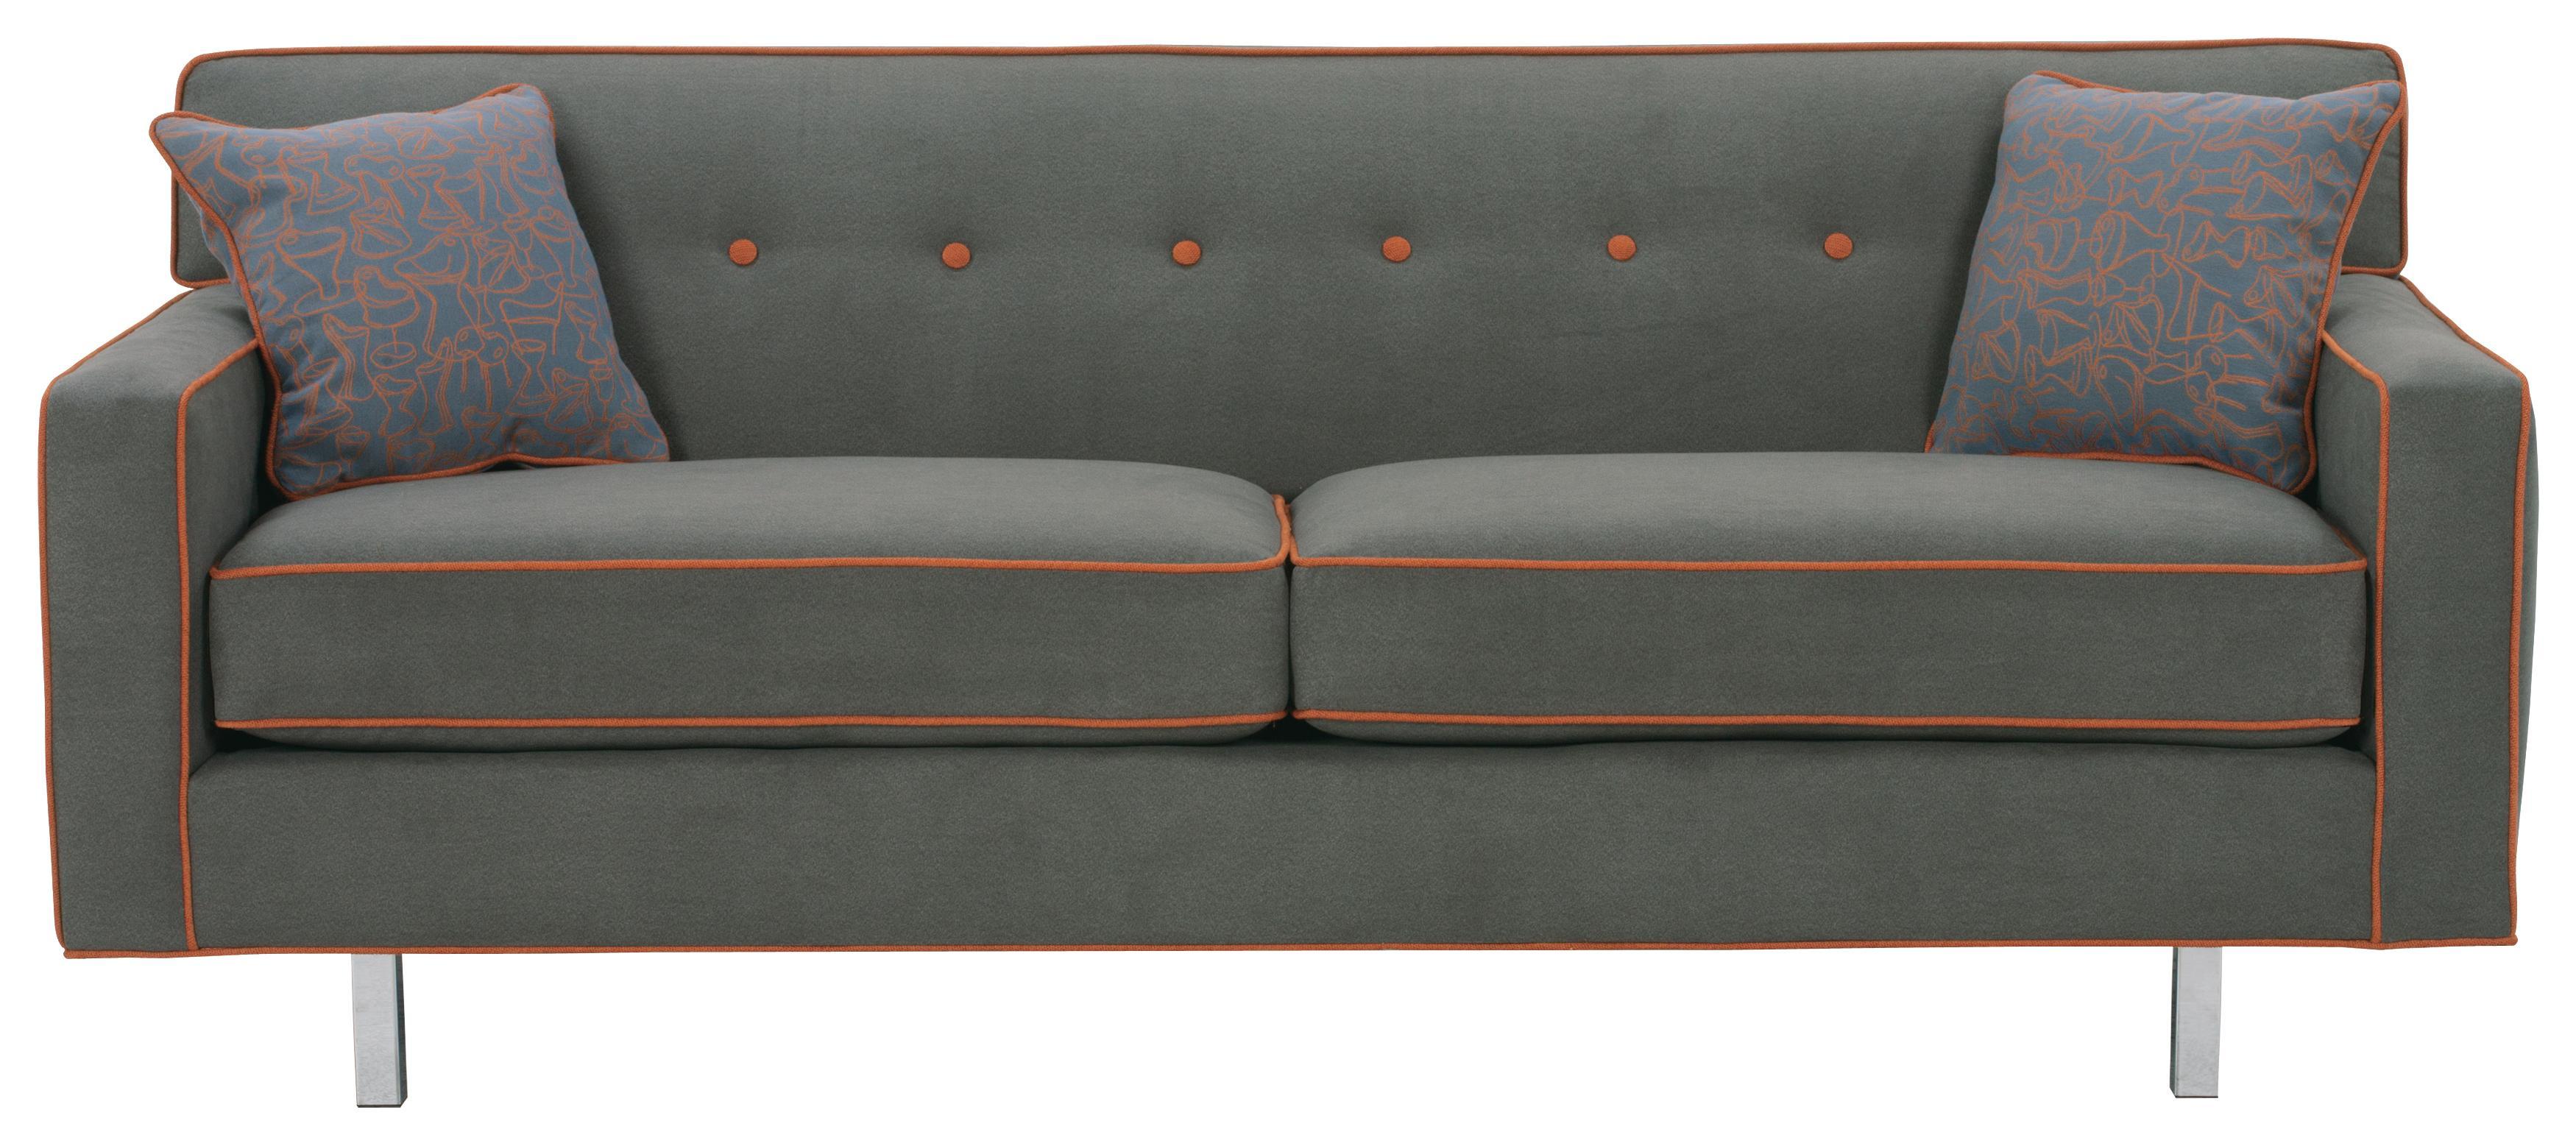 "Rowe Dorset 75"" 2 Cushion Sofa Chrome Legs AHFA Sofa Dealer"